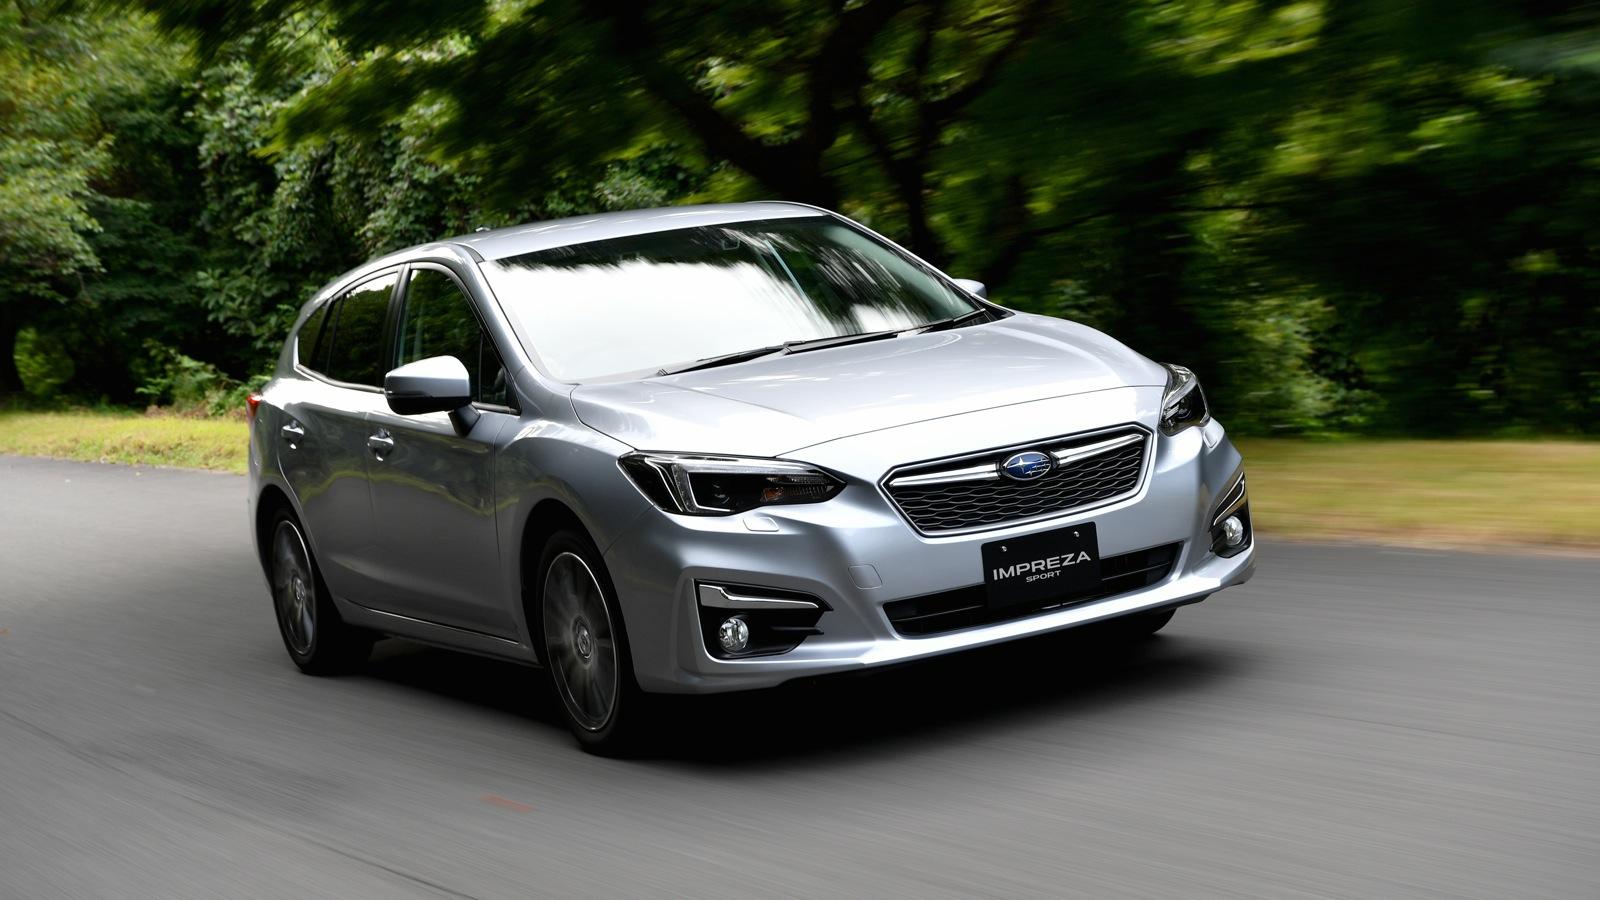 Subaru Impreza 2017